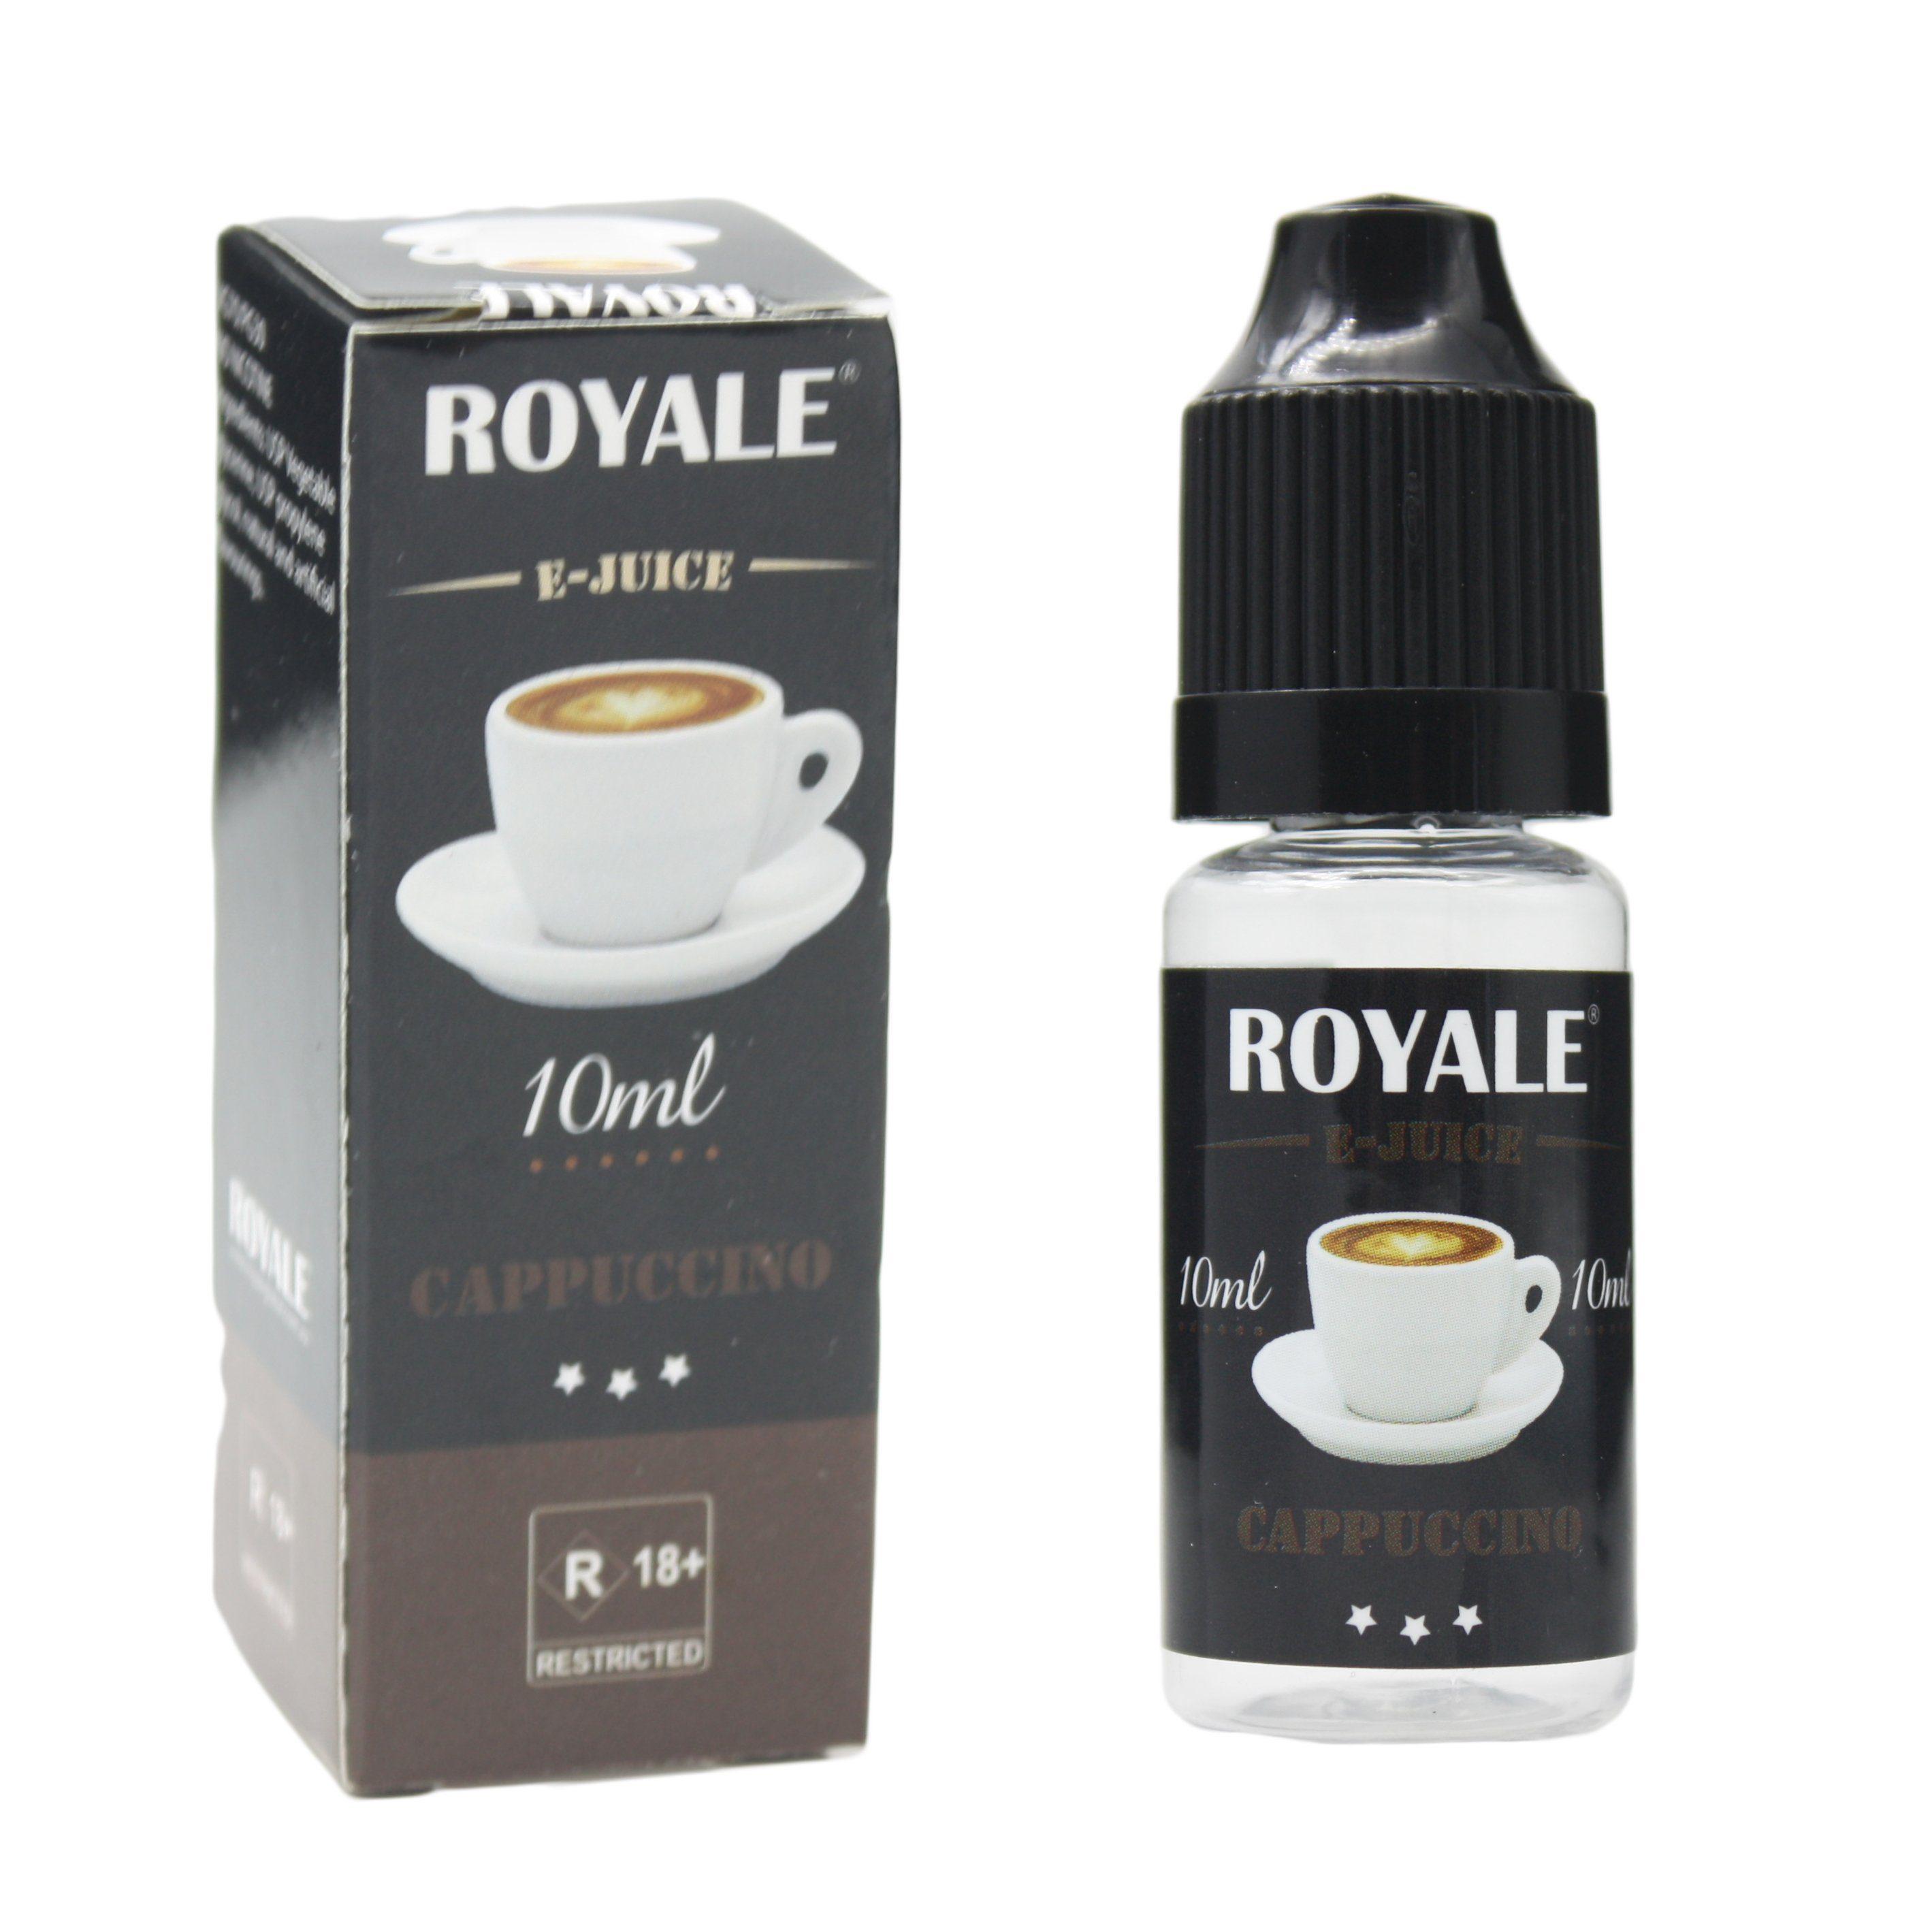 Royale E-juice- Cappuccino